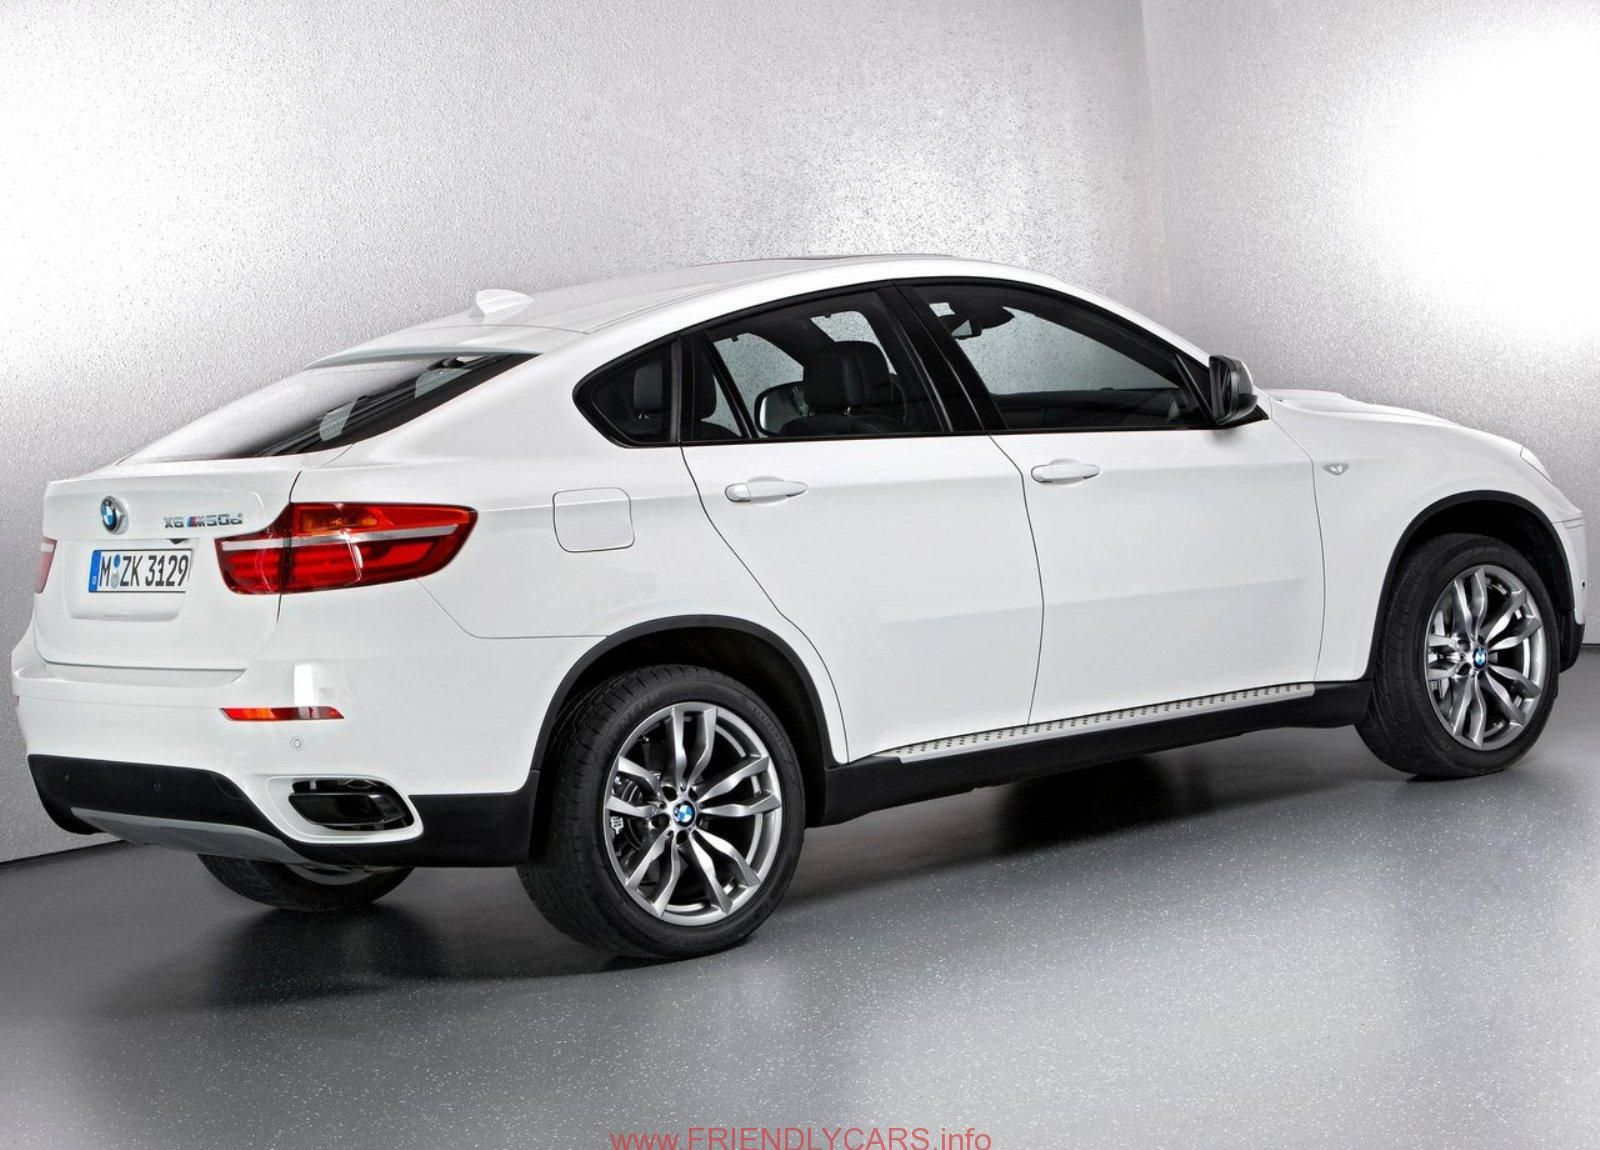 Bmw Car All Models 1600x1150 Wallpaper Teahub Io